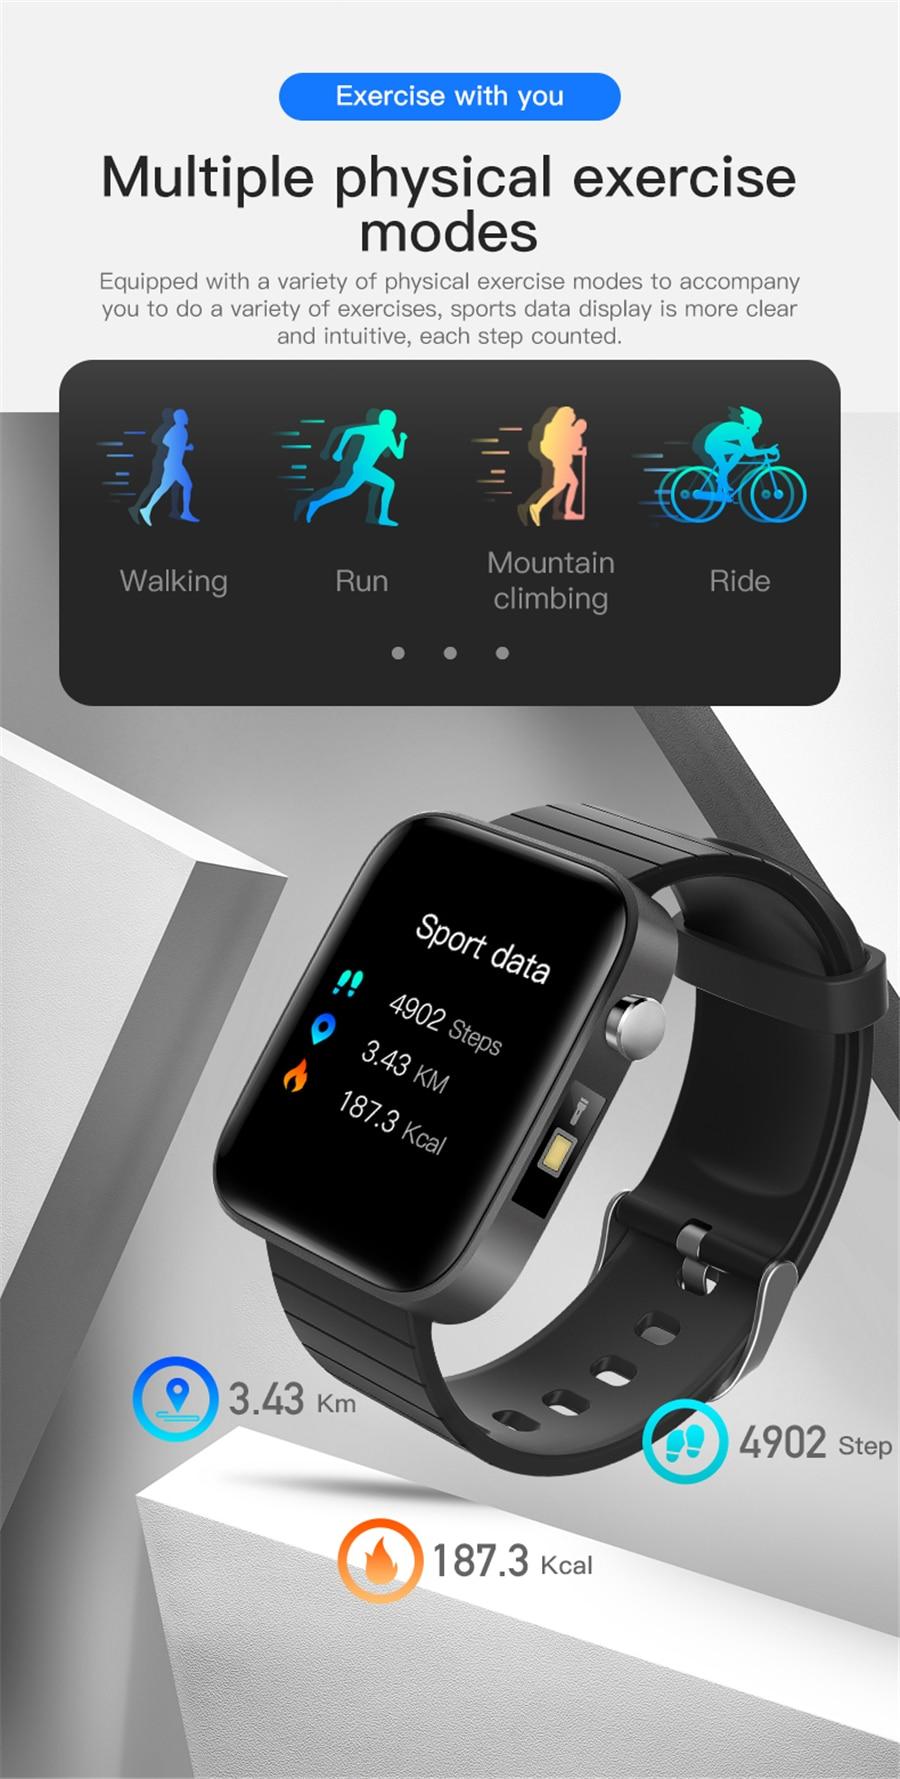 He575a43593624c55923e89edcde23239f T68 Men Women Smart Watch with Body Temperature Measure Sports Fitness Watch Heart Rate Blood Pressure Oxygen Monitor Smartwatch